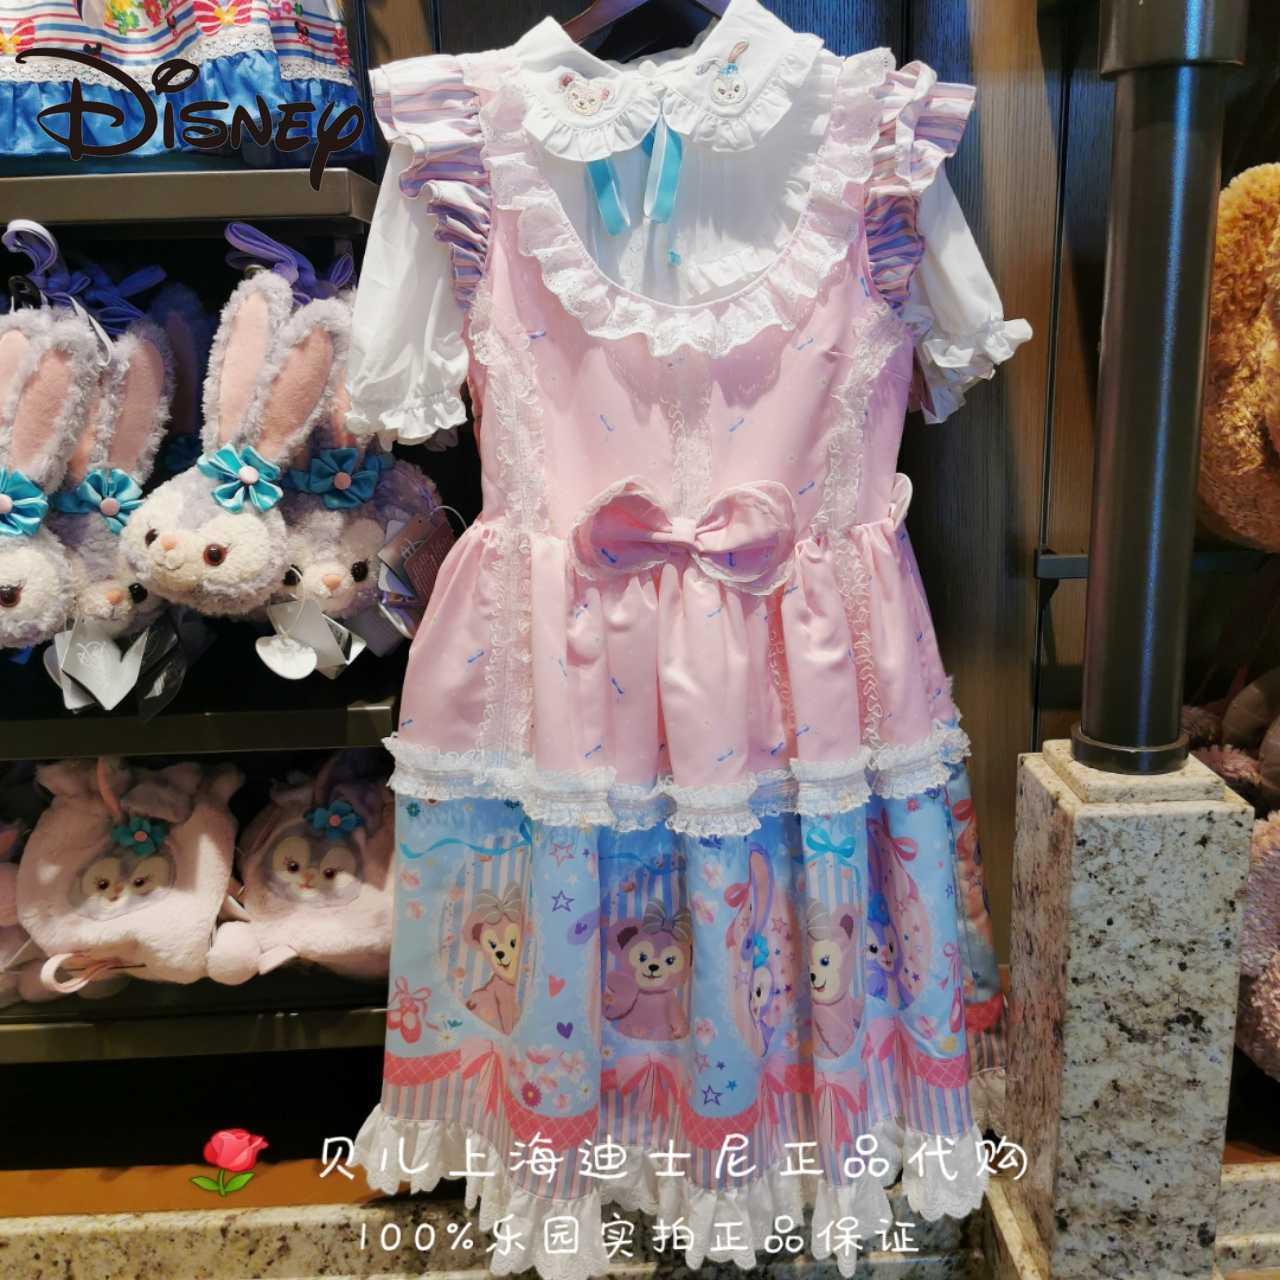 Disney Duffy Bear Shirley Merstar Delo Lolita Dress Lolita Women's Dress long skirts for women mid length skirt Cartoon